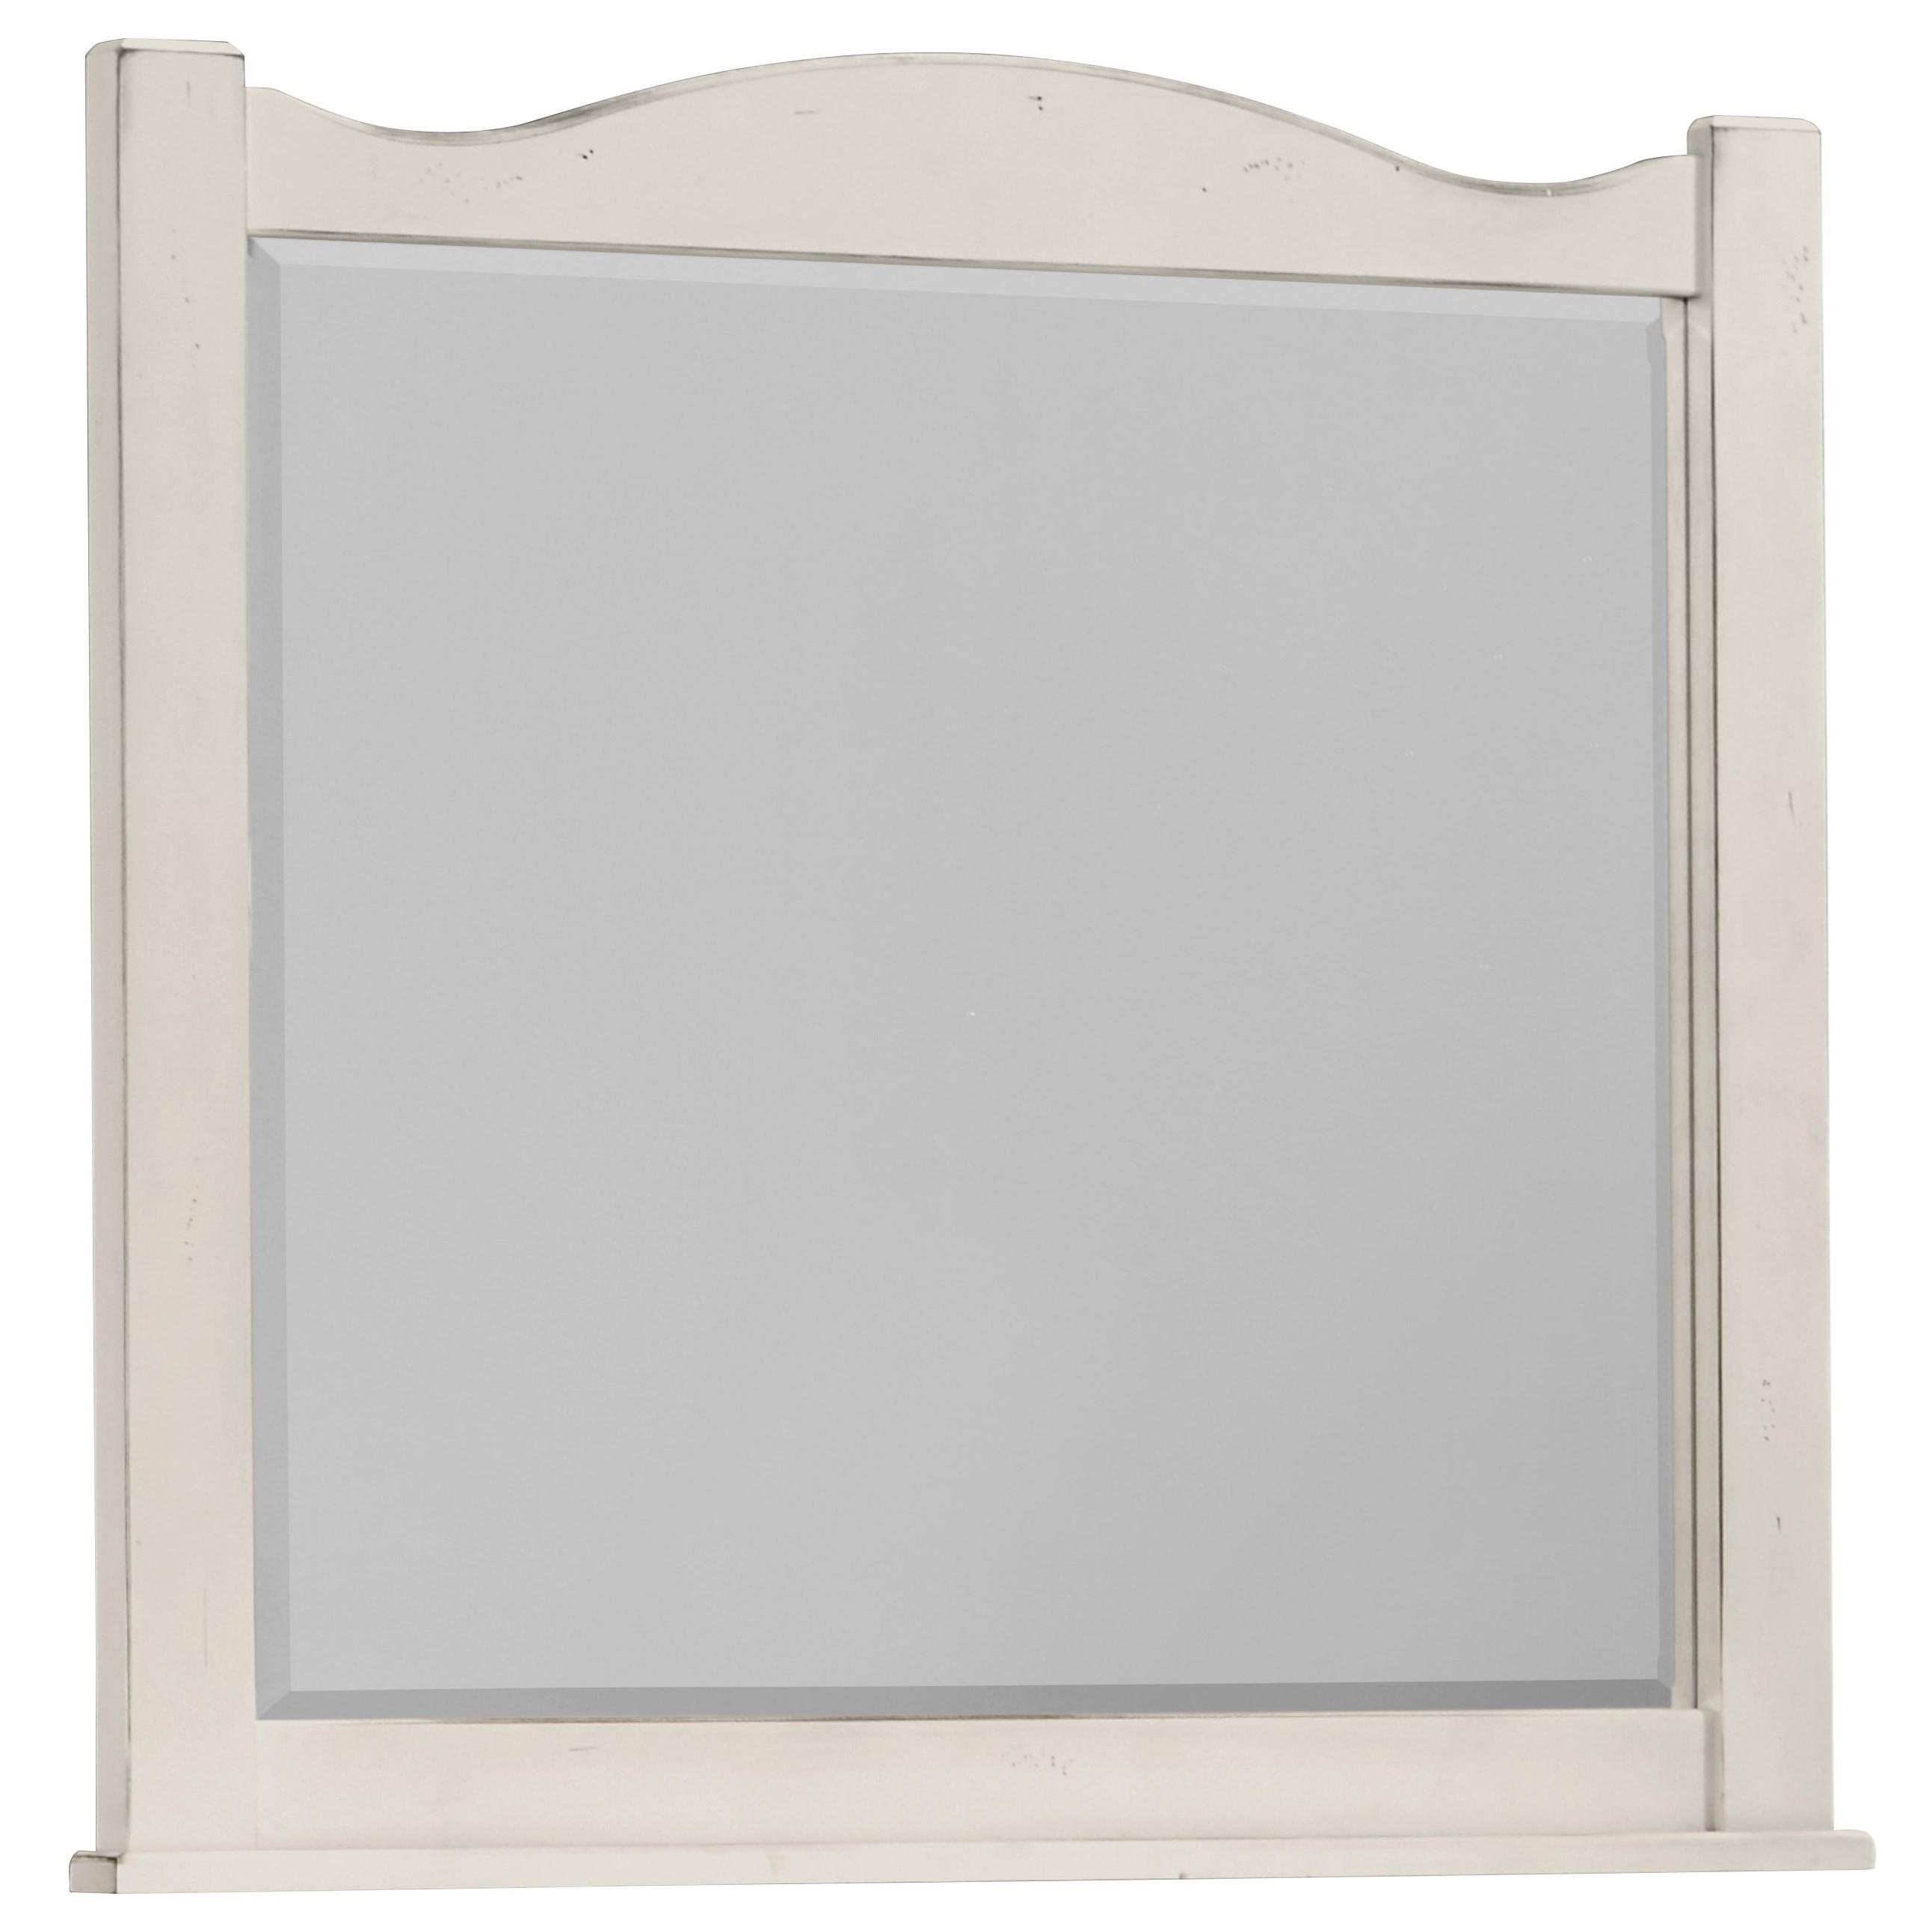 Vaughan Bassett American Maple Landscape Mirror - Beveled Glass - Item Number: 404-446